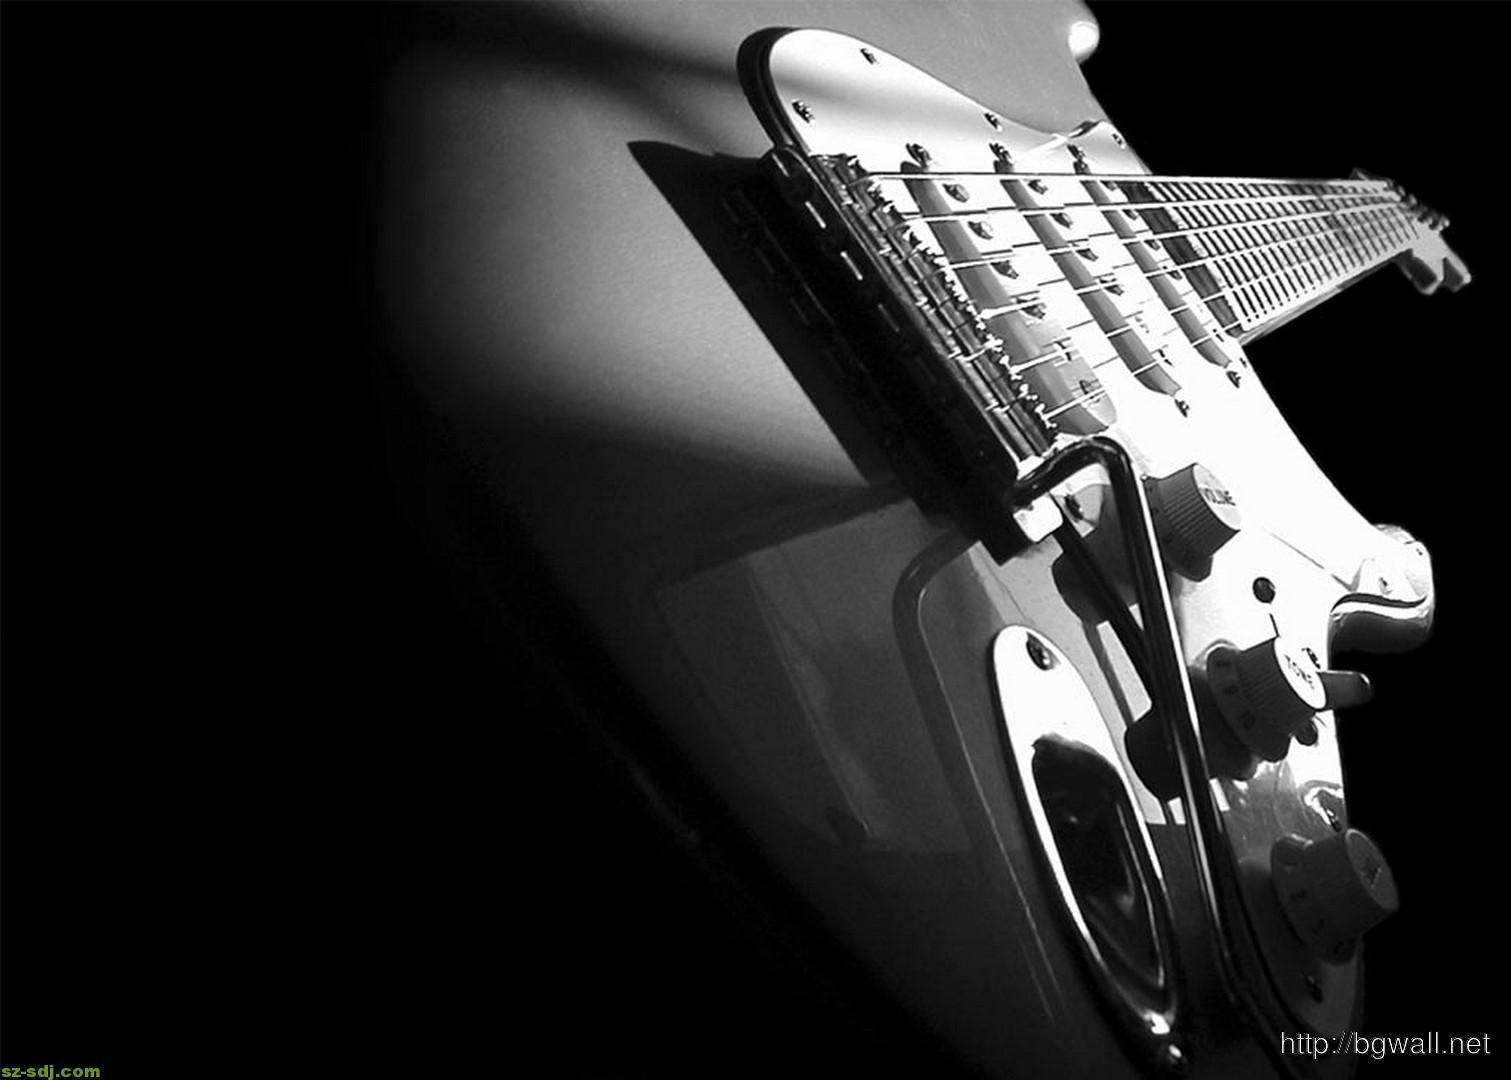 fender-guitar-desktop-wallpaper